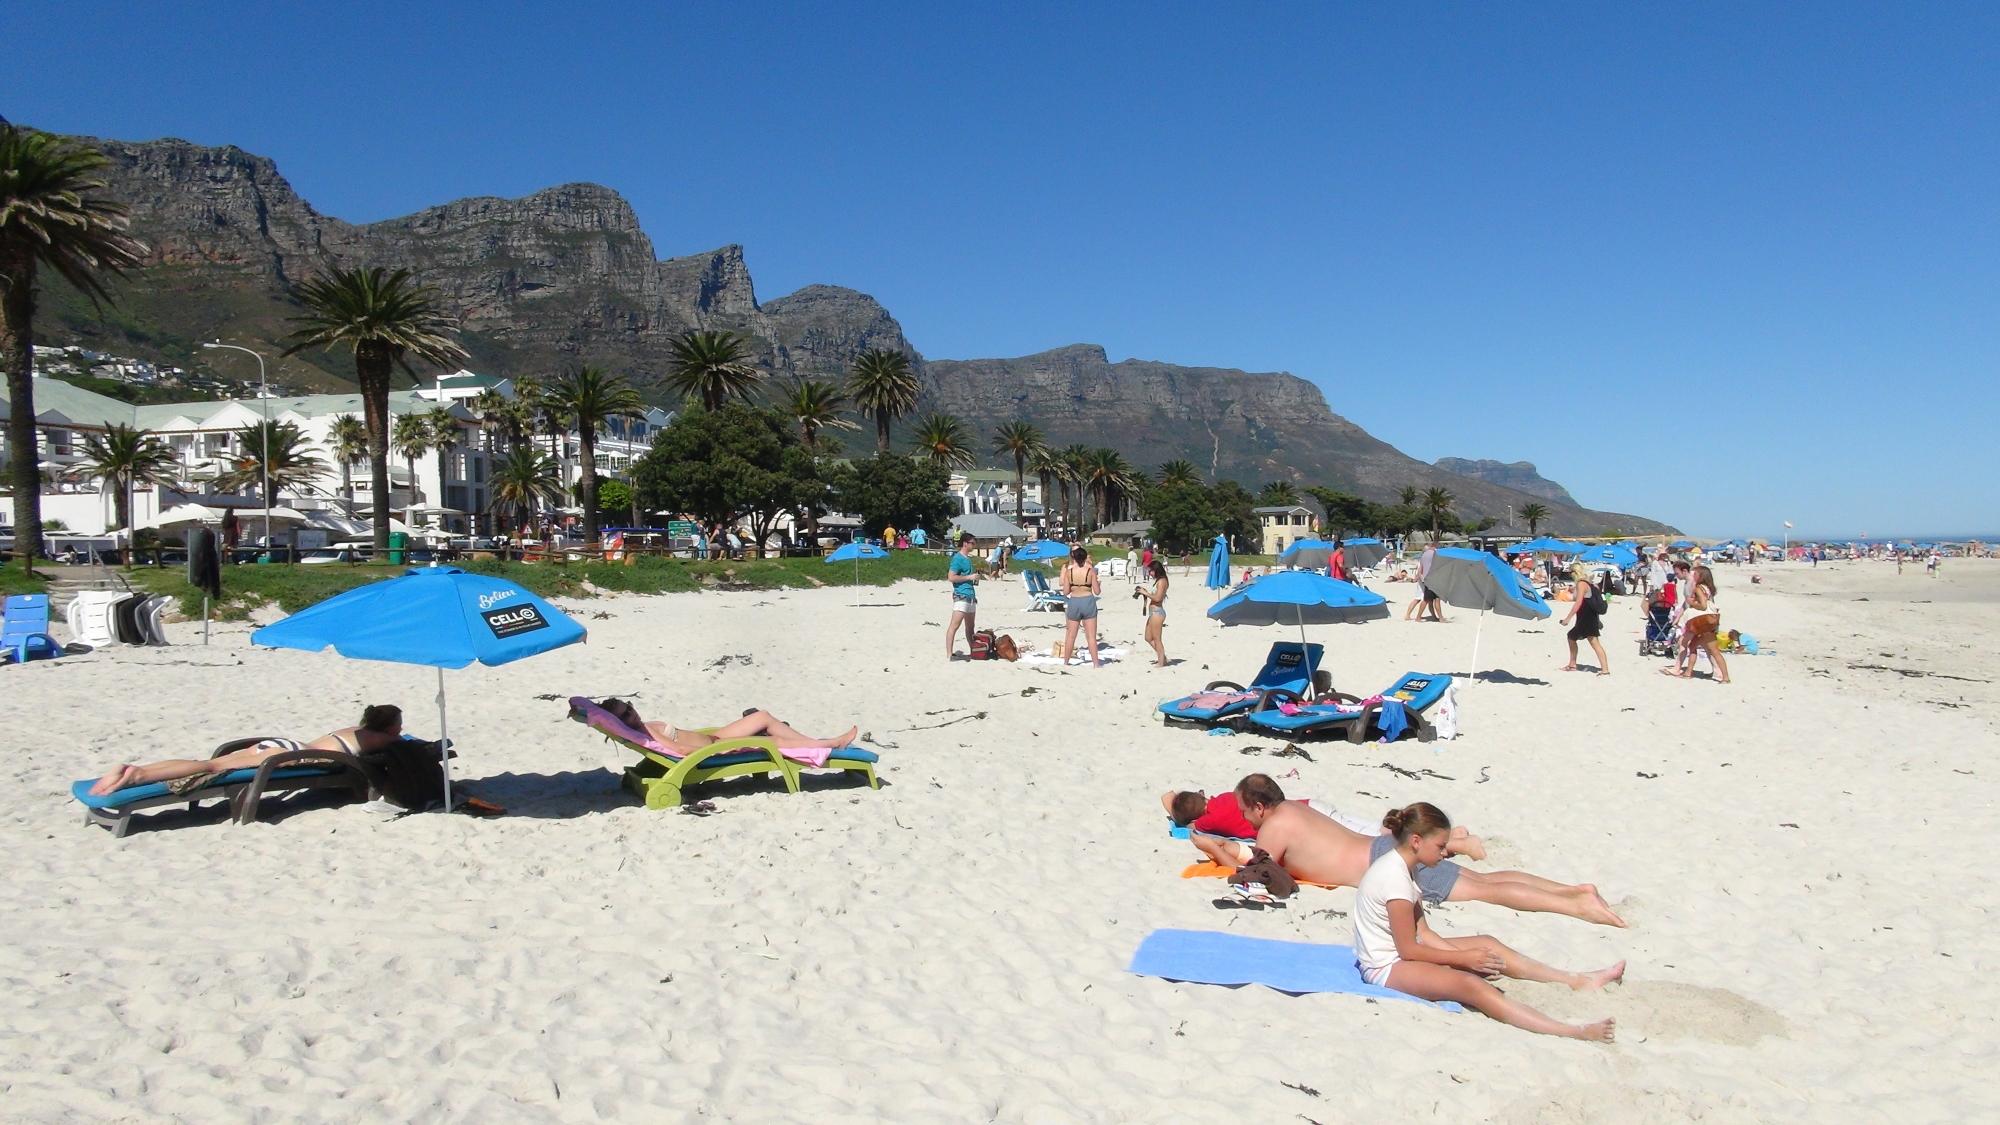 Camps Bay Beach - De stranden van Kaapstad Zuid-Afrika